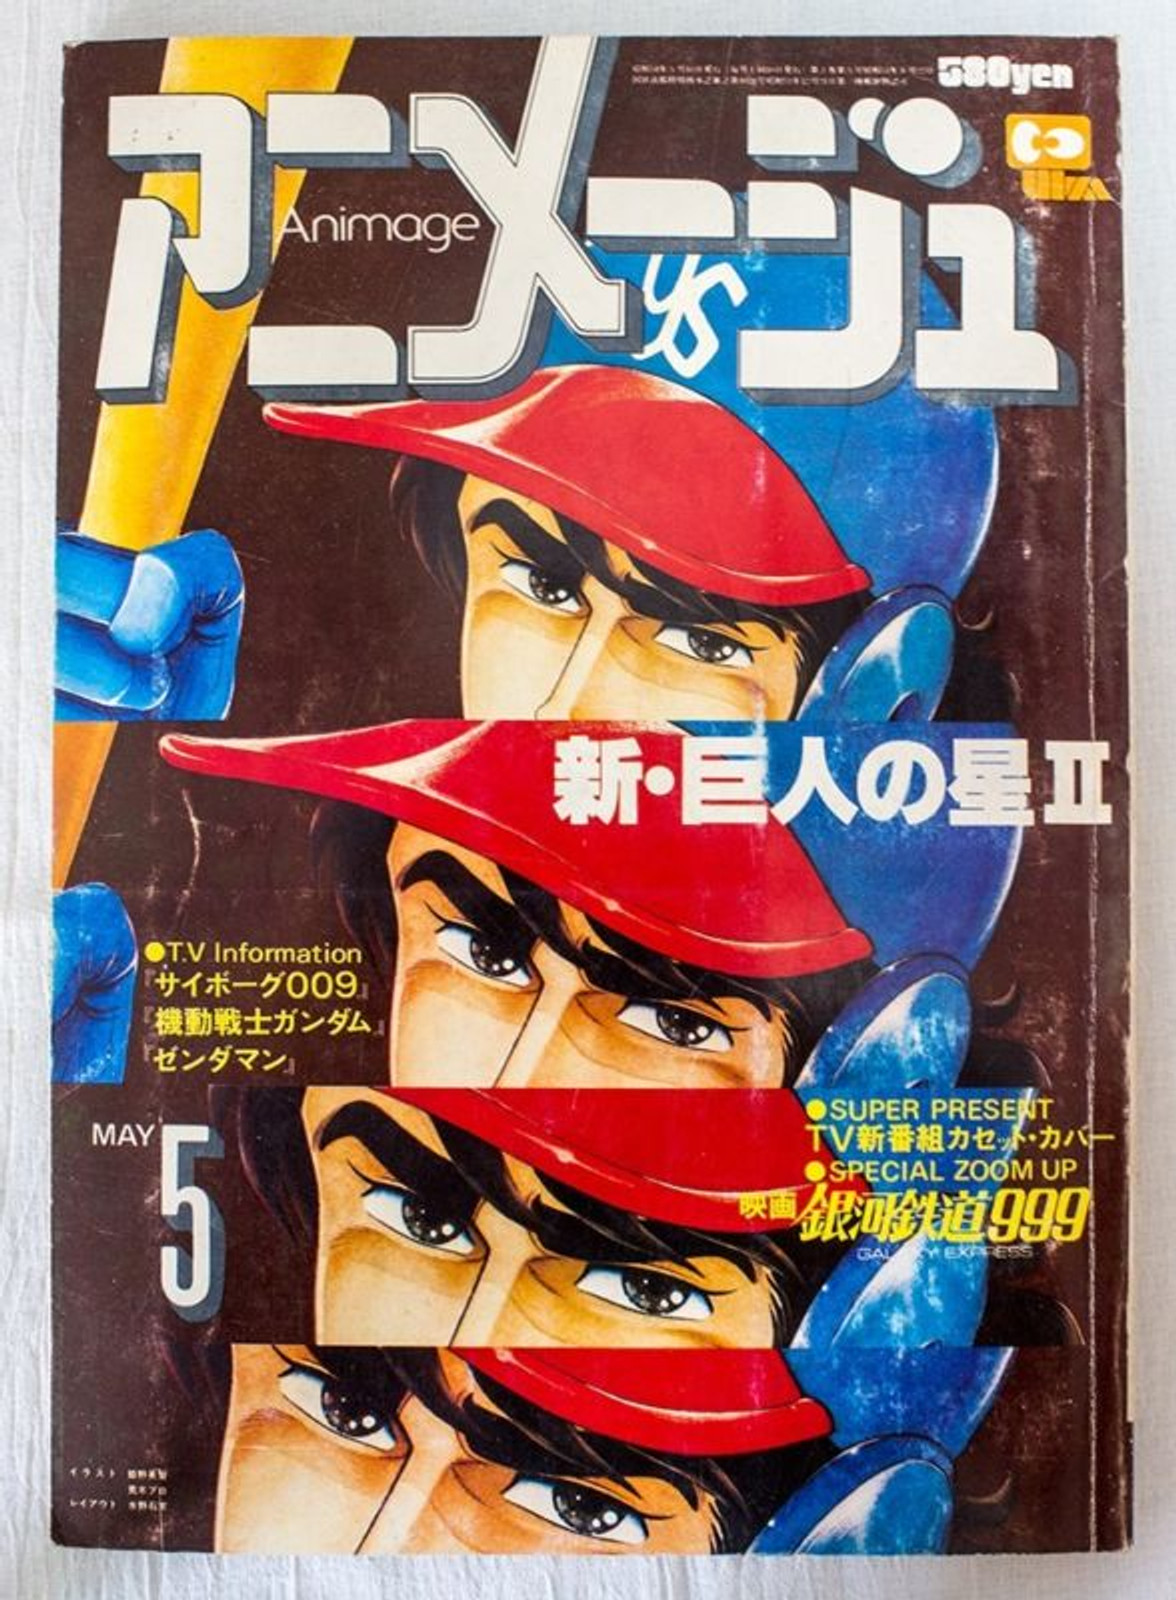 Animage Magazine 05/1979 Japan ANIME STAR OF GIANTS/GUNDAM/ZENDAMAN/999